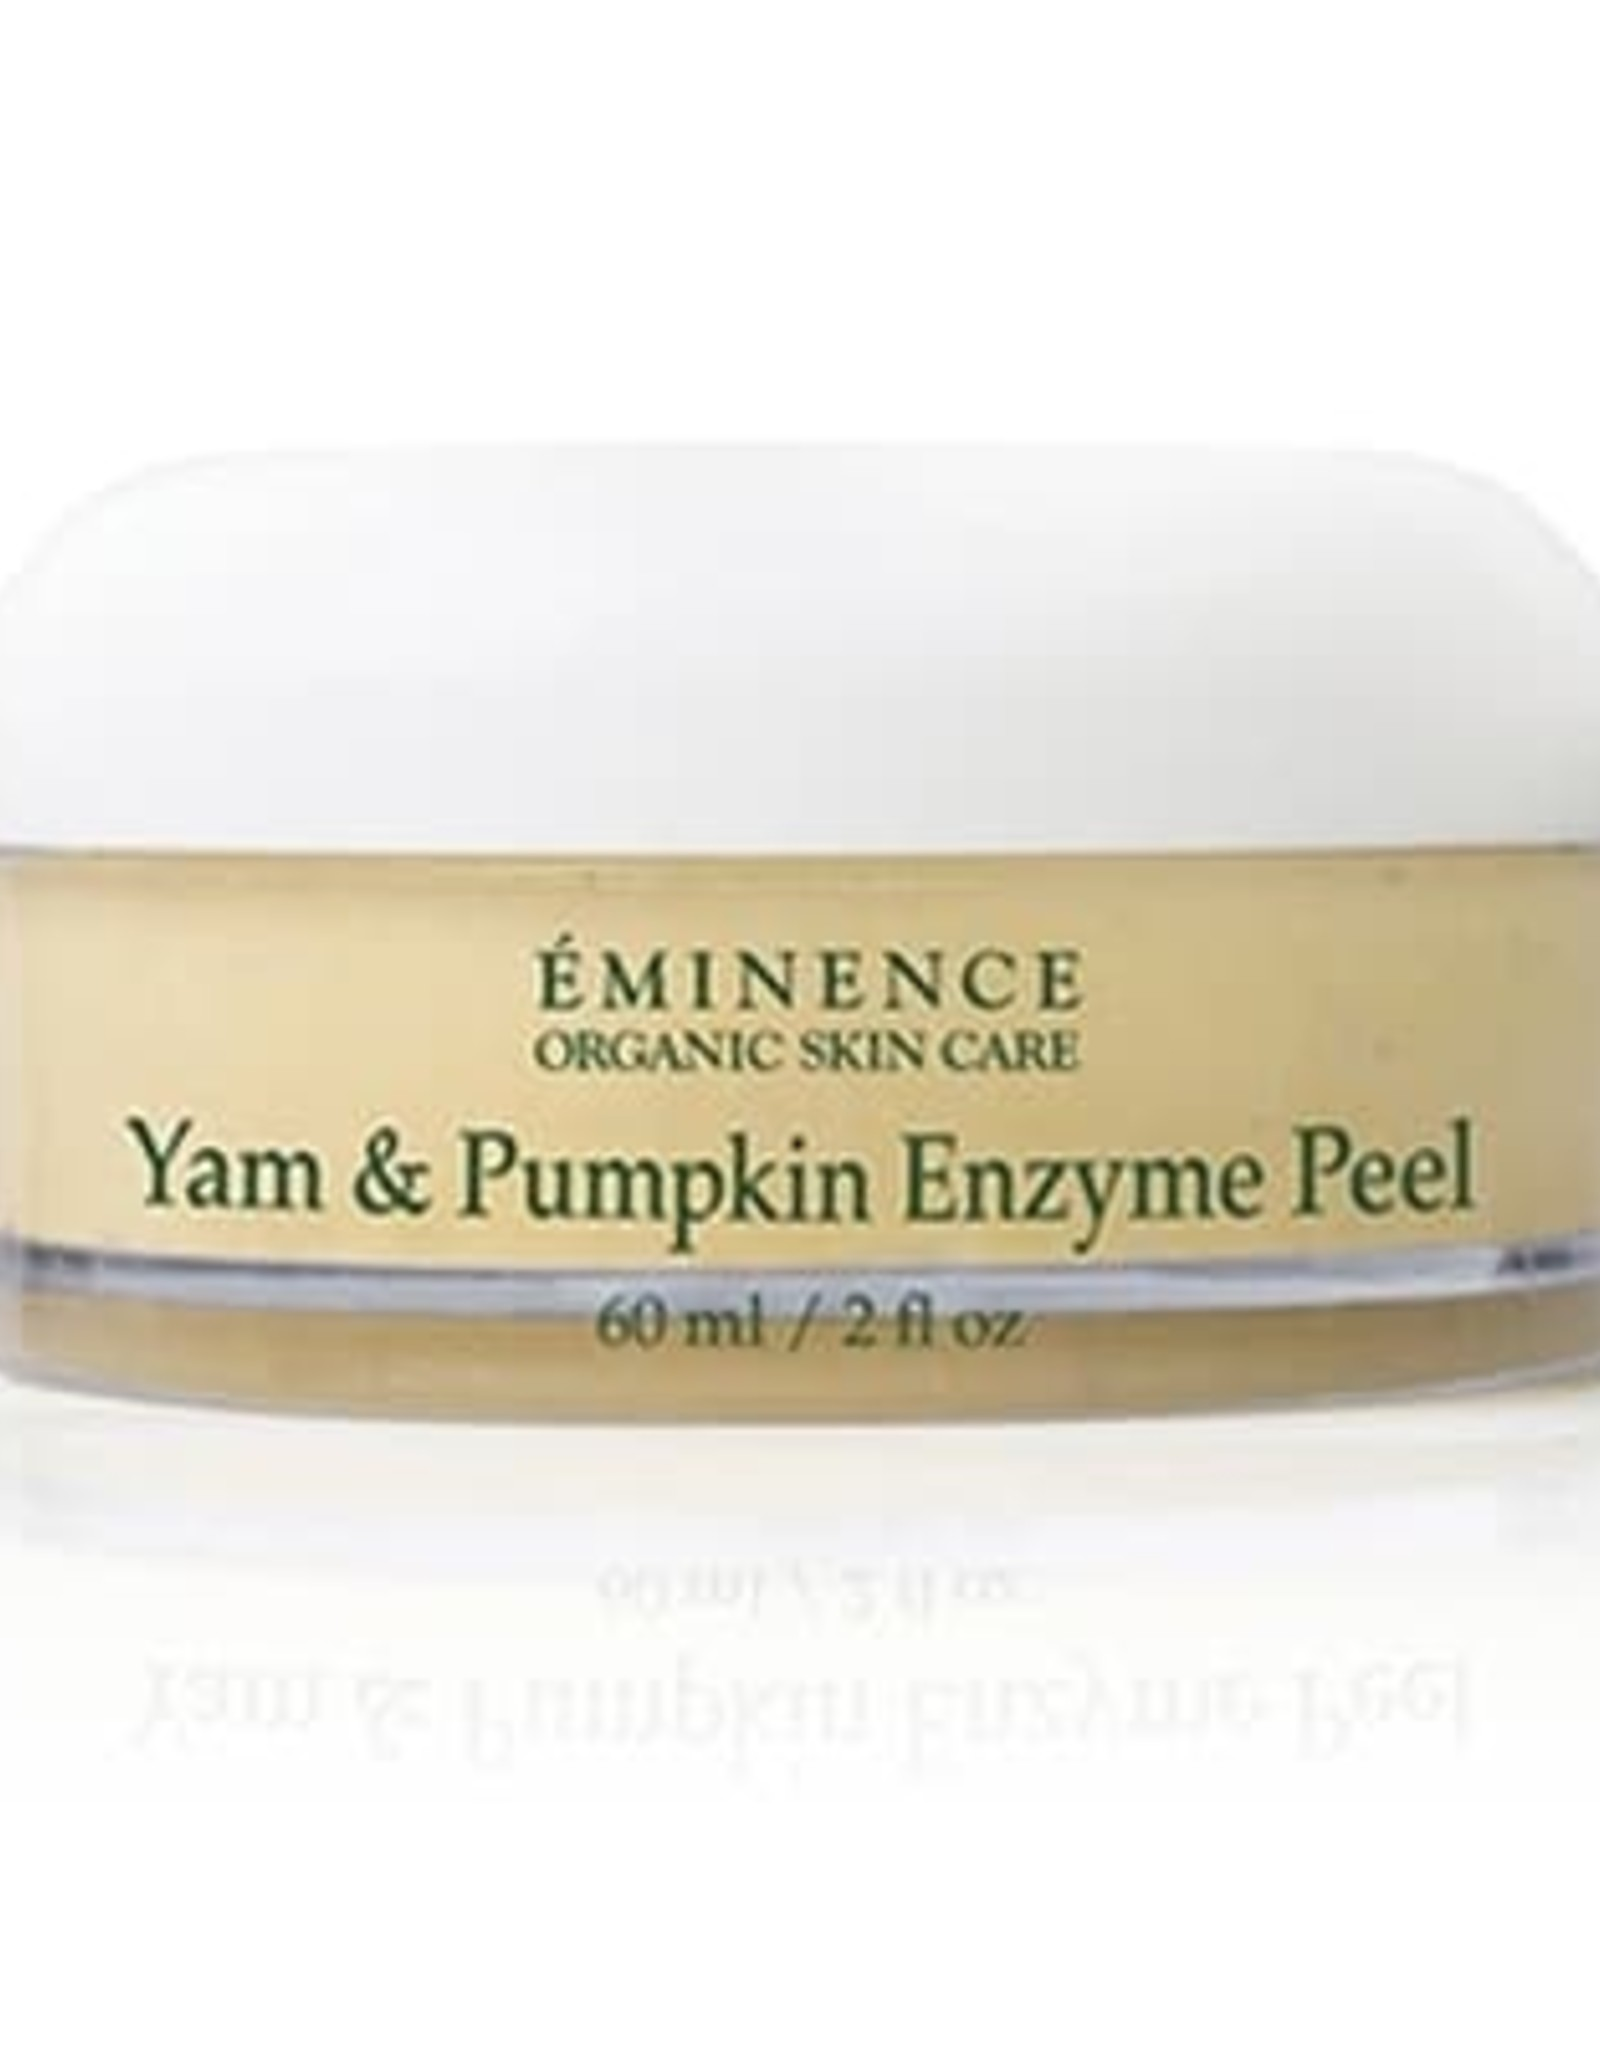 Eminence Yam & Pumpkin Enzyme Peel